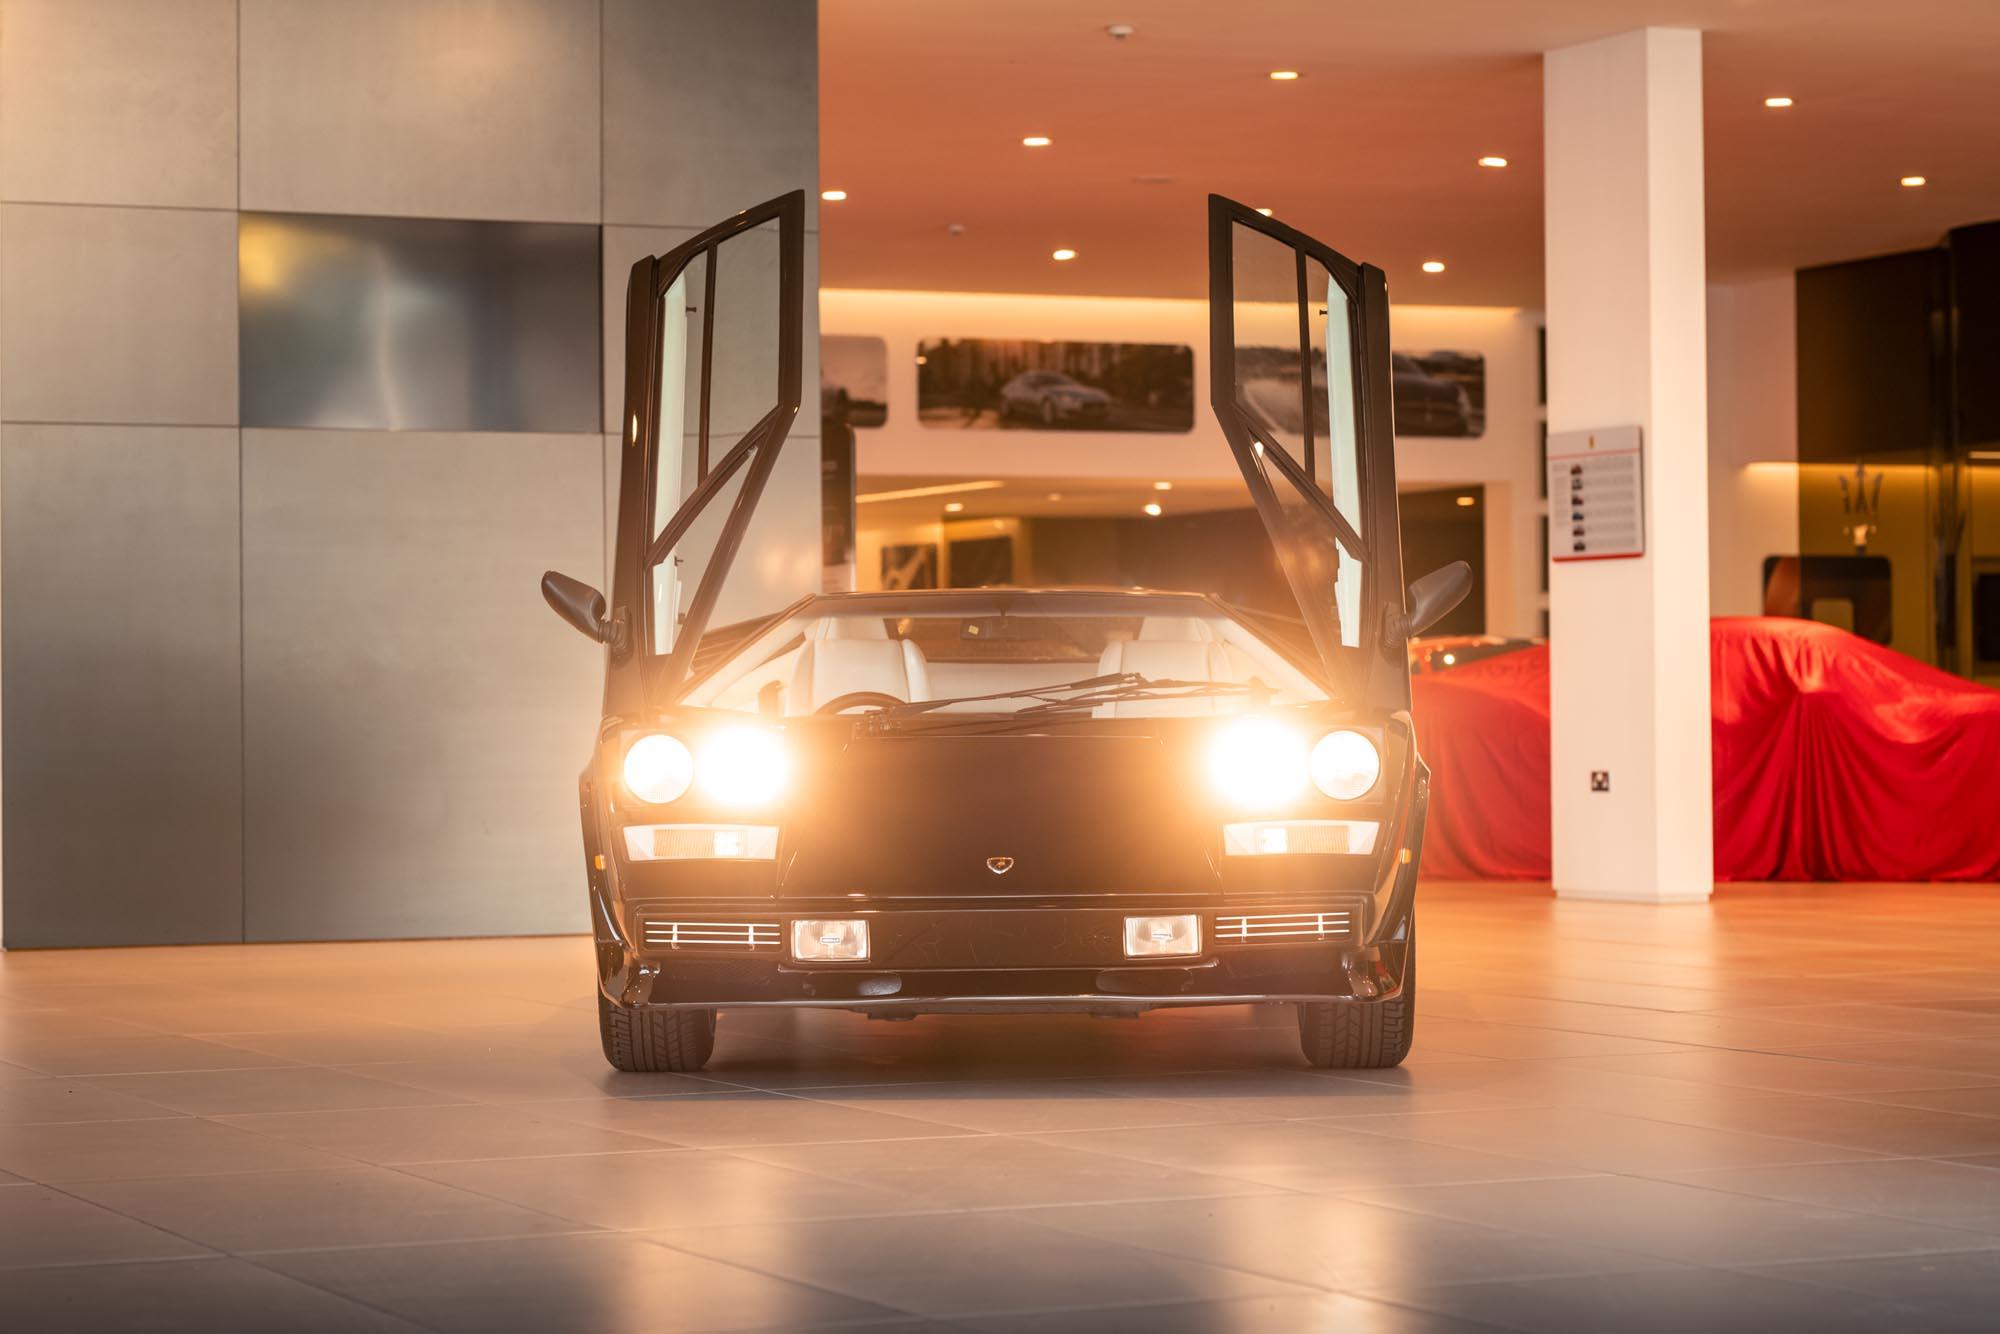 Rare Lamborghini Countach Restoration Photographed for JCT600